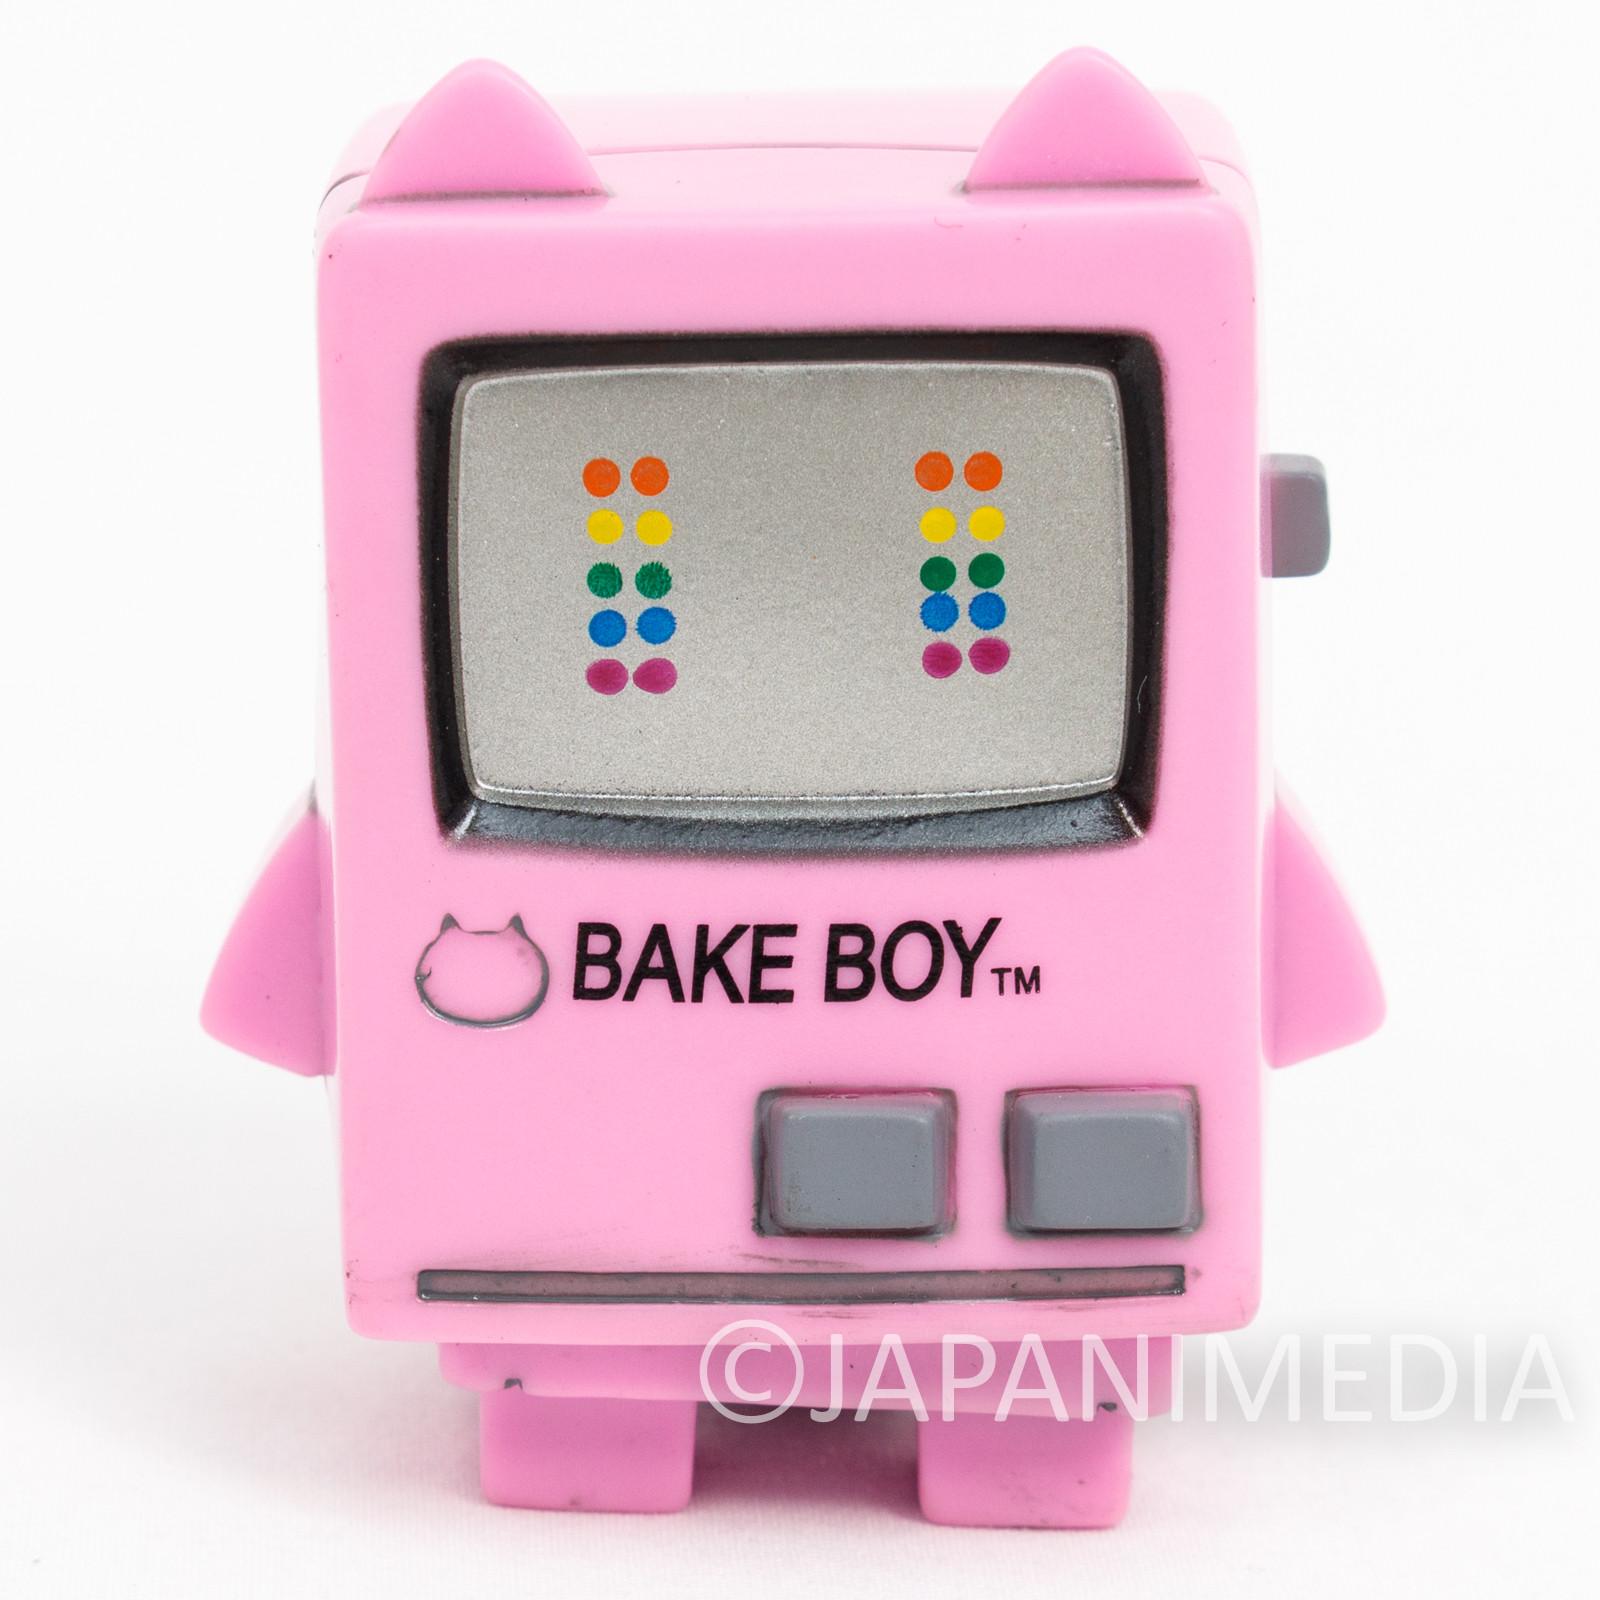 BAKETAN Pink ver. Soft Vinyl Figure Medicom Toy VAG Series JAPAN